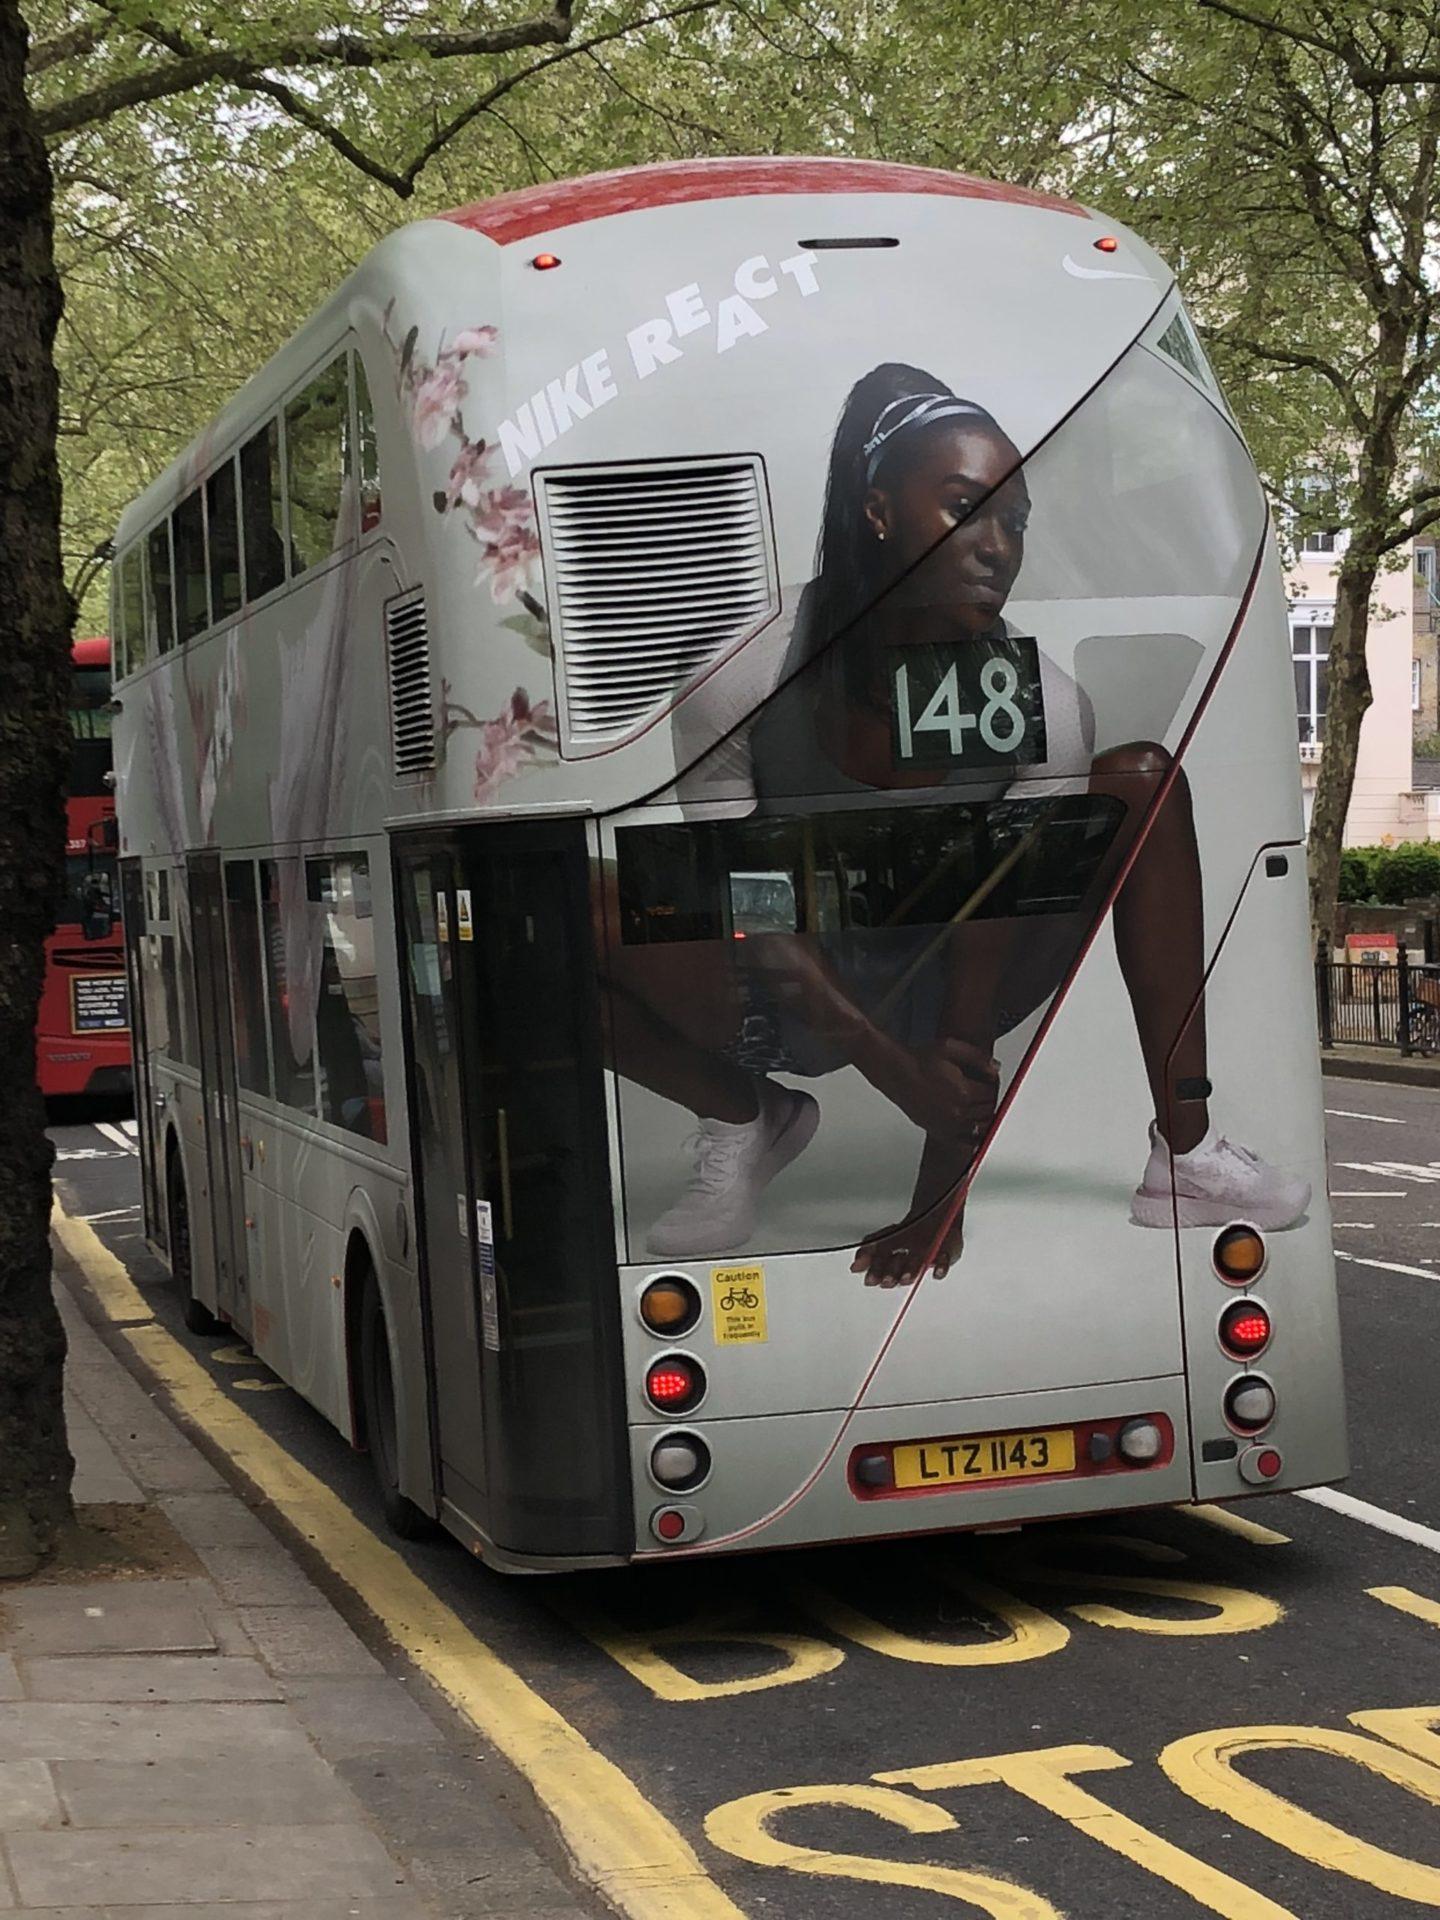 nike-london-bus-wrap-contra-vision